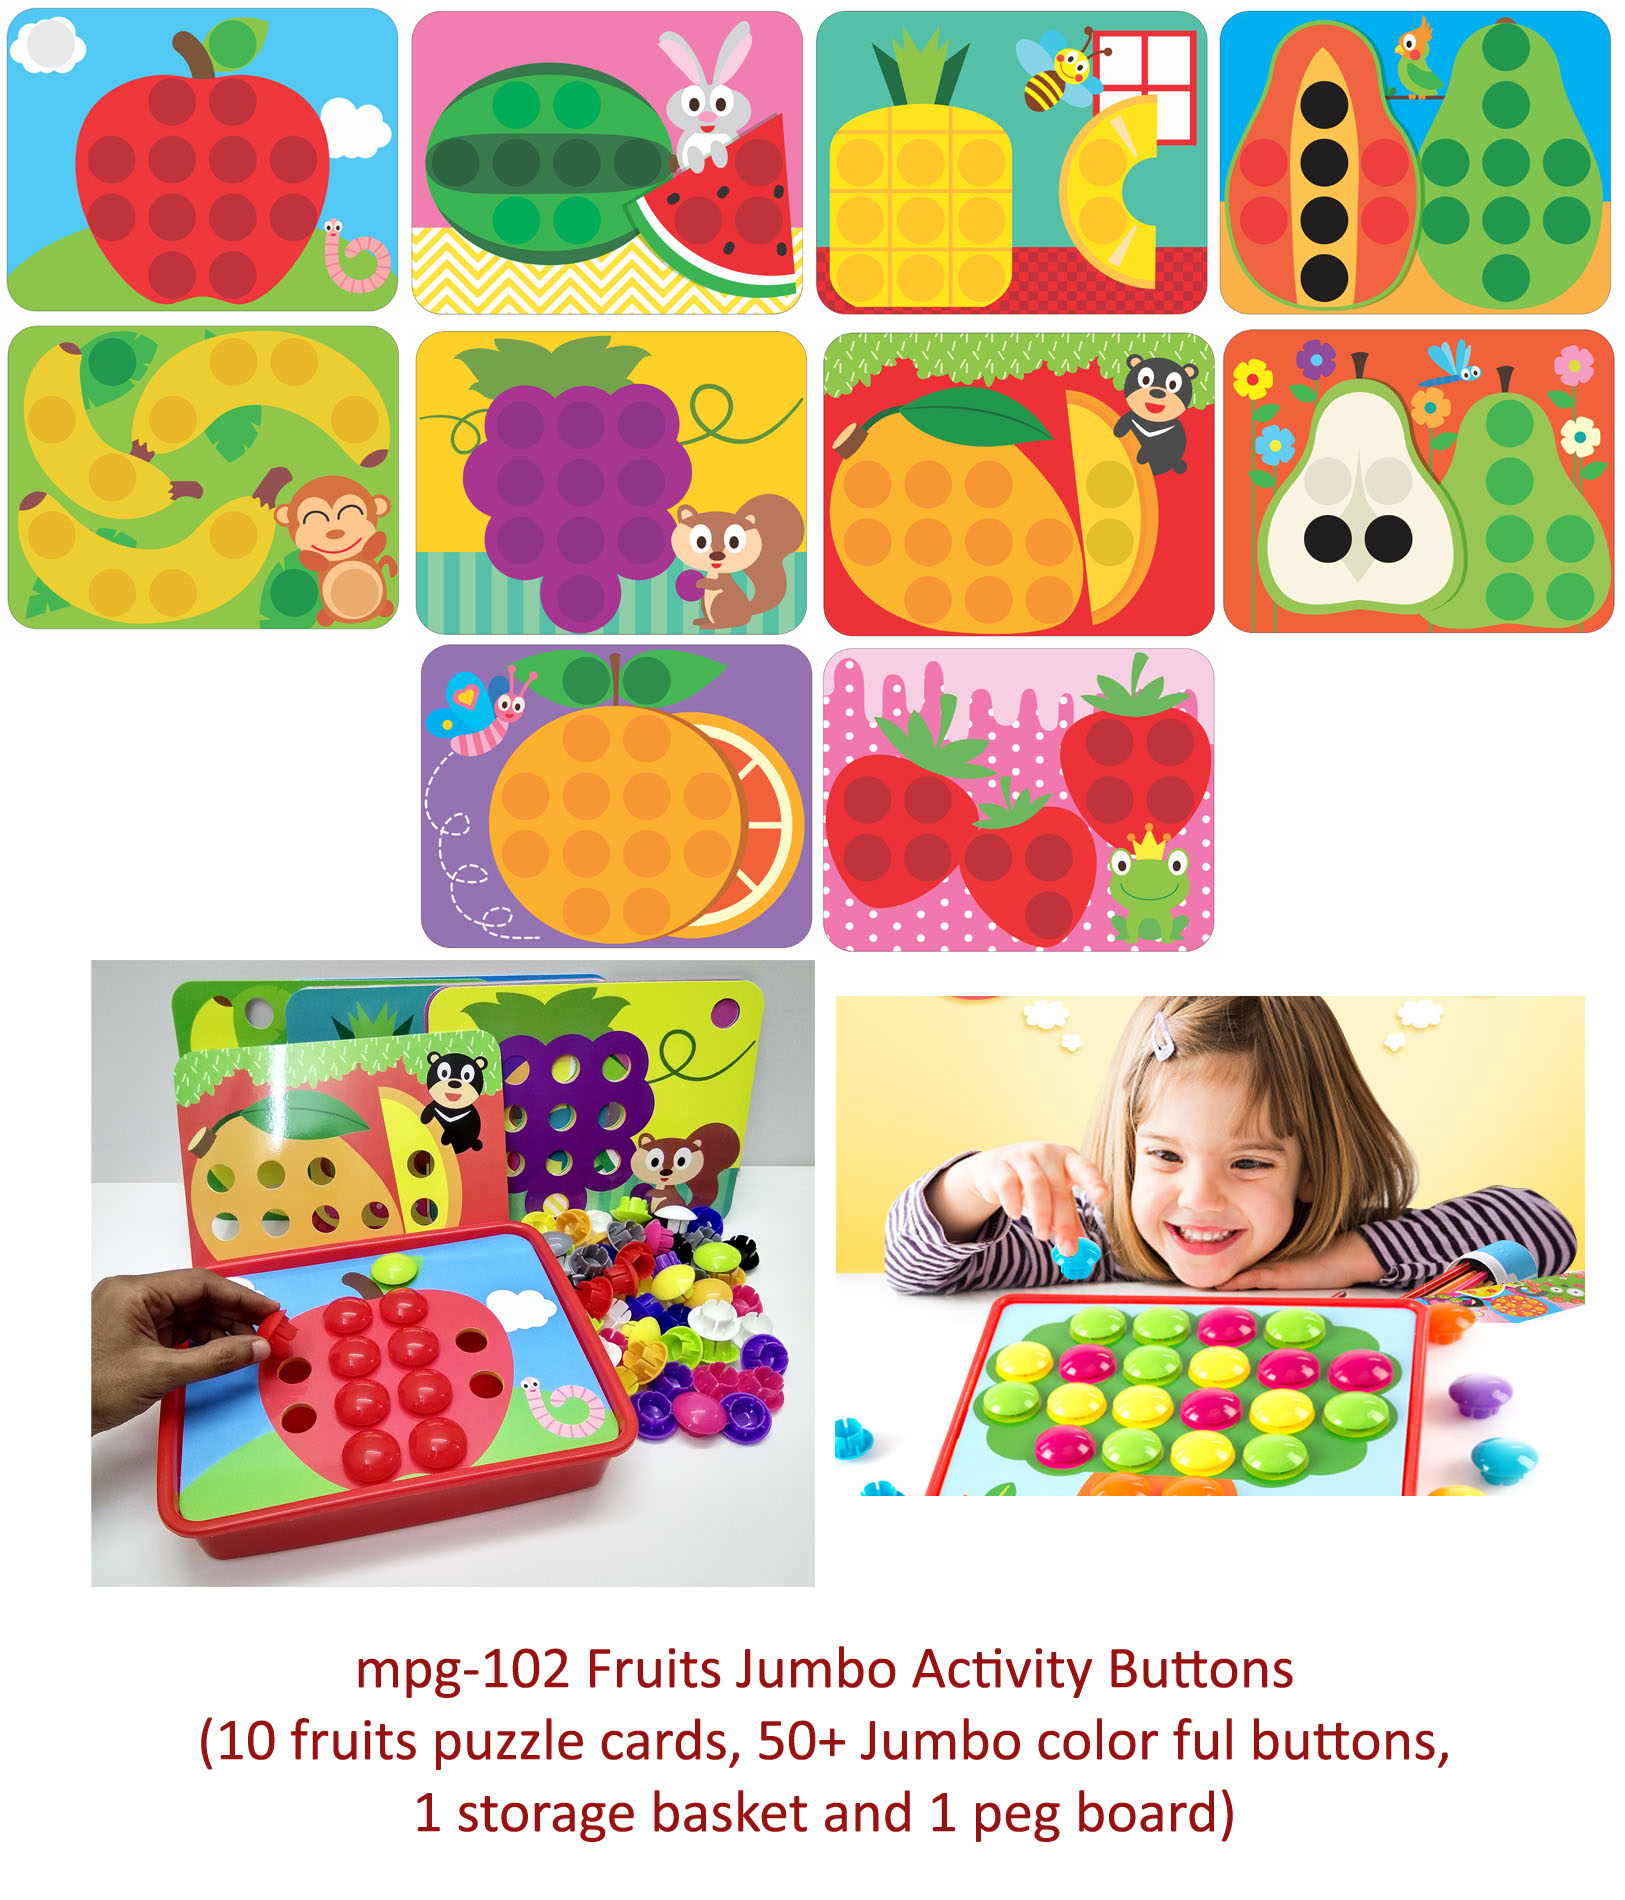 Educational Toys For Preschoolers Preschool Classroom